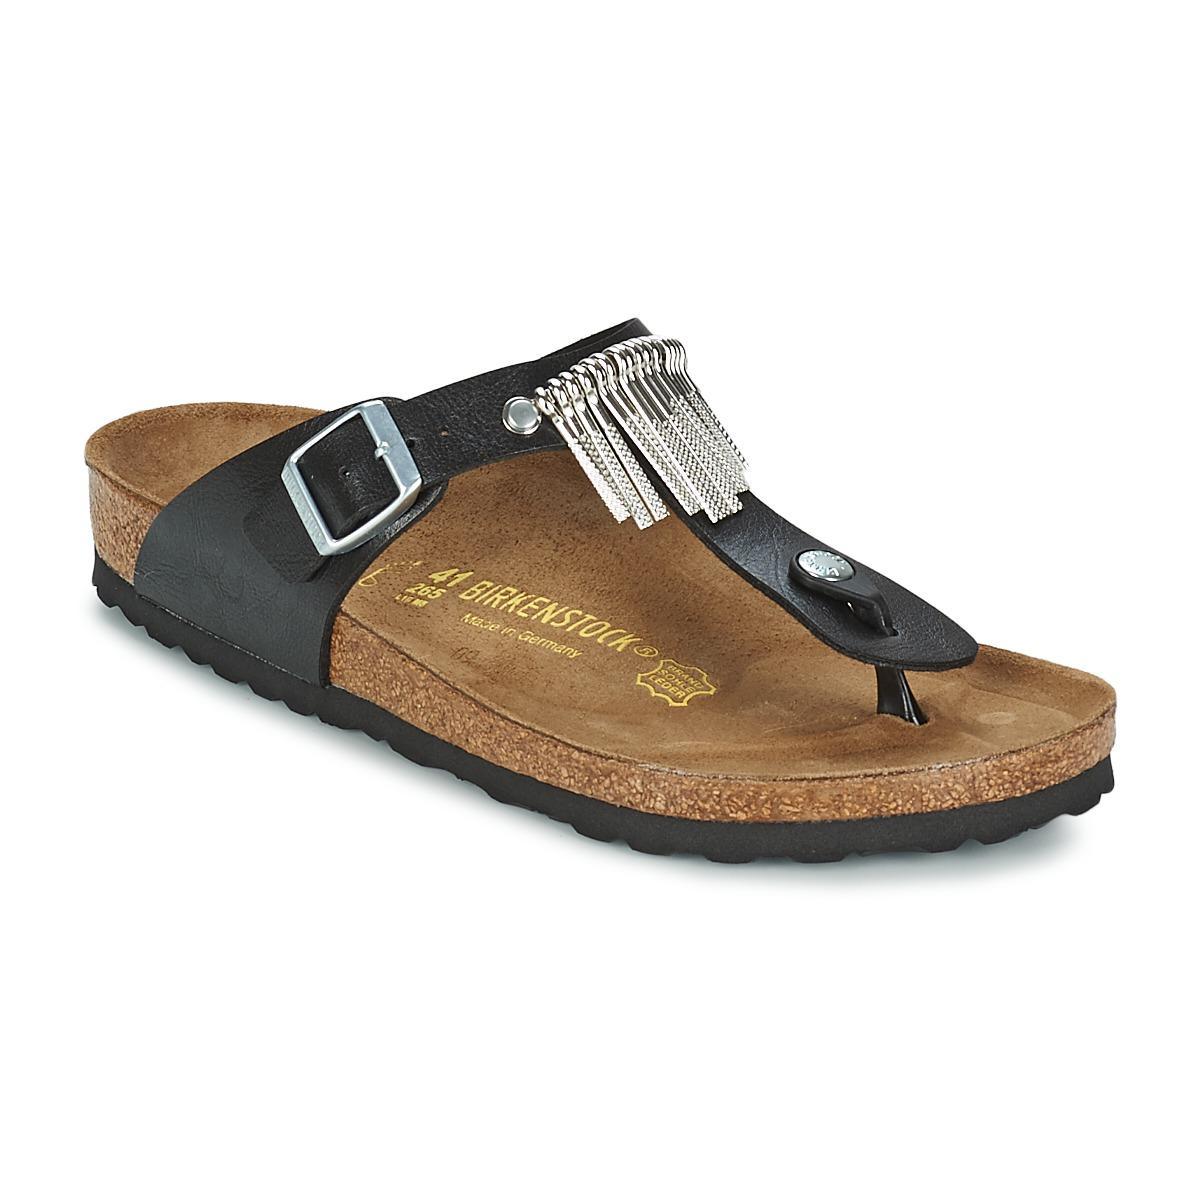 0179ae894b1e Birkenstock Gizeh Fringe Flip Flops   Sandals (shoes) in Black - Lyst